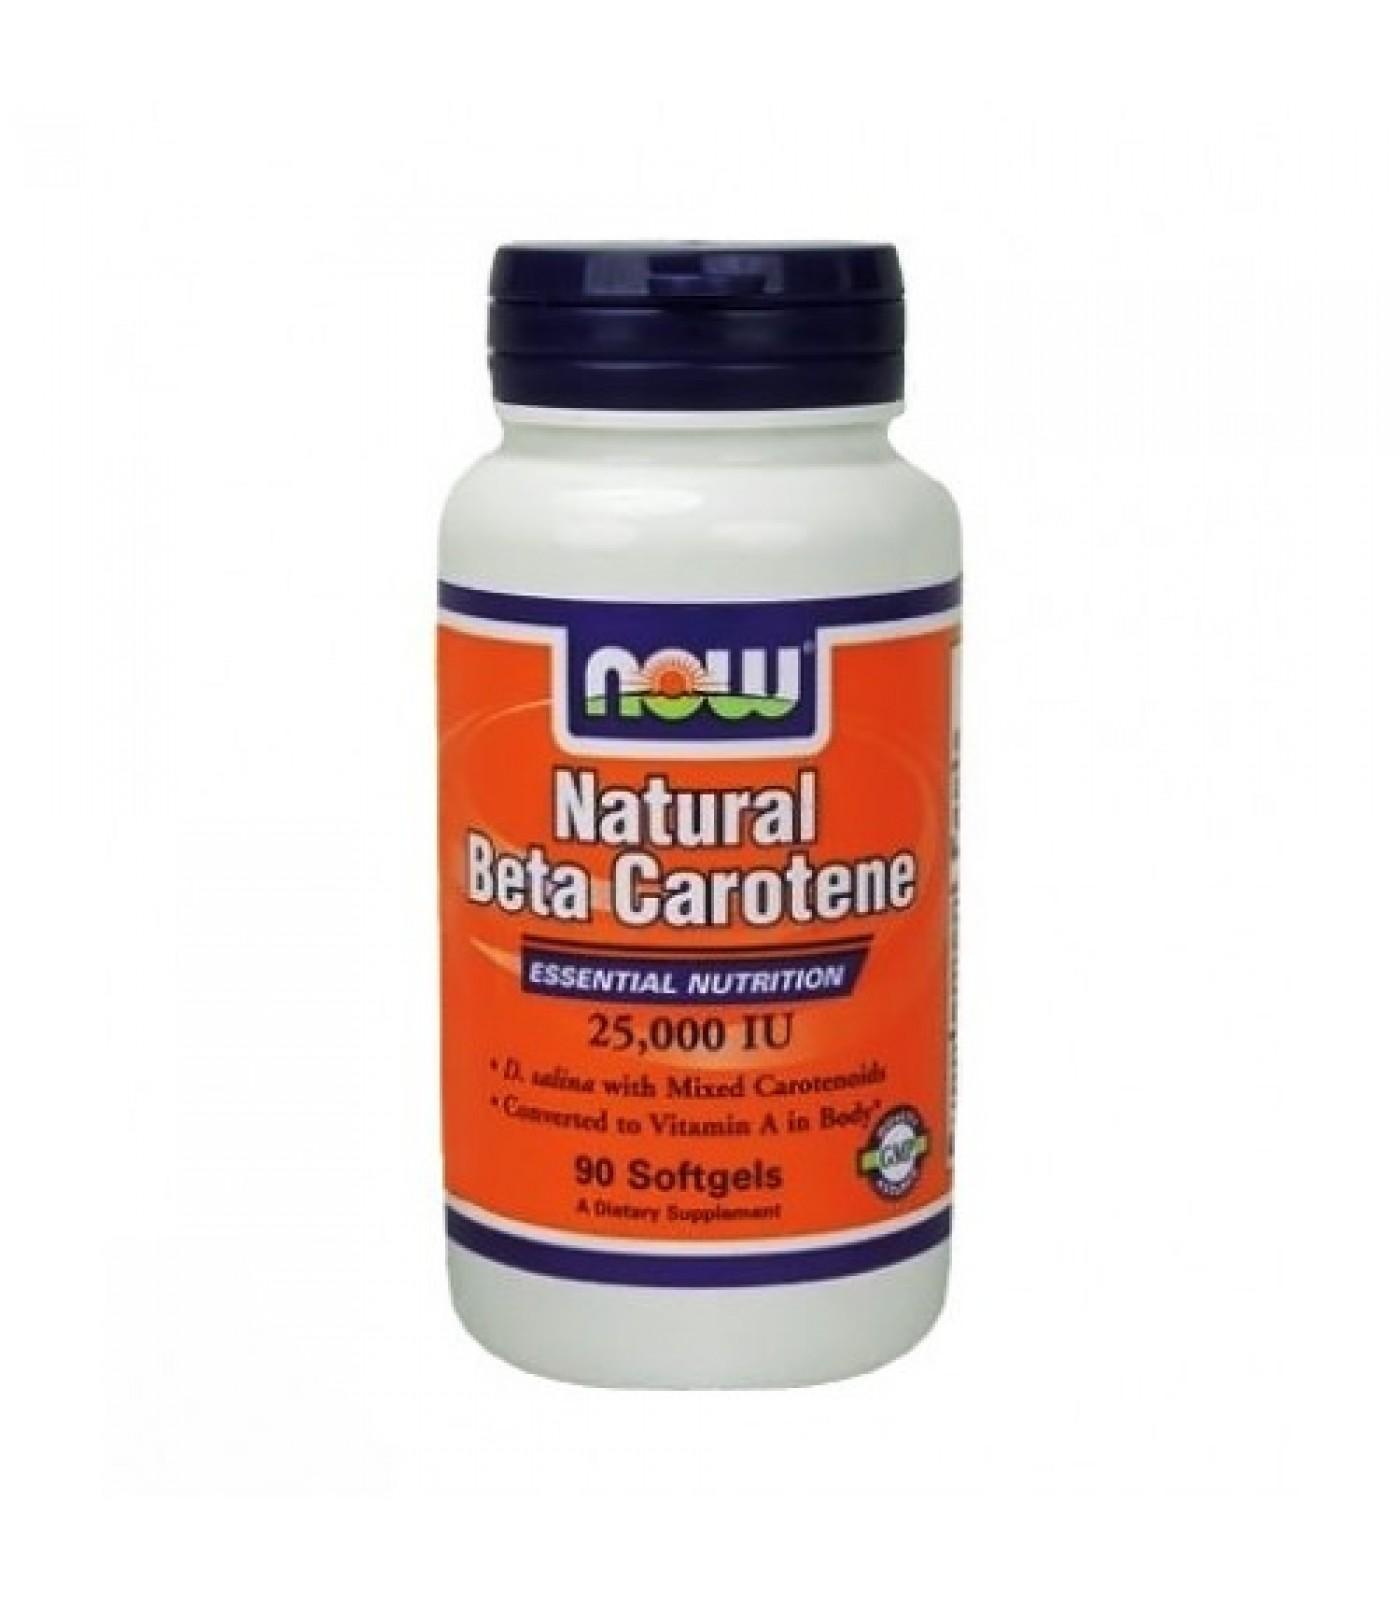 NOW - Beta Carotene Natural 25.000 IU / 90 softgels